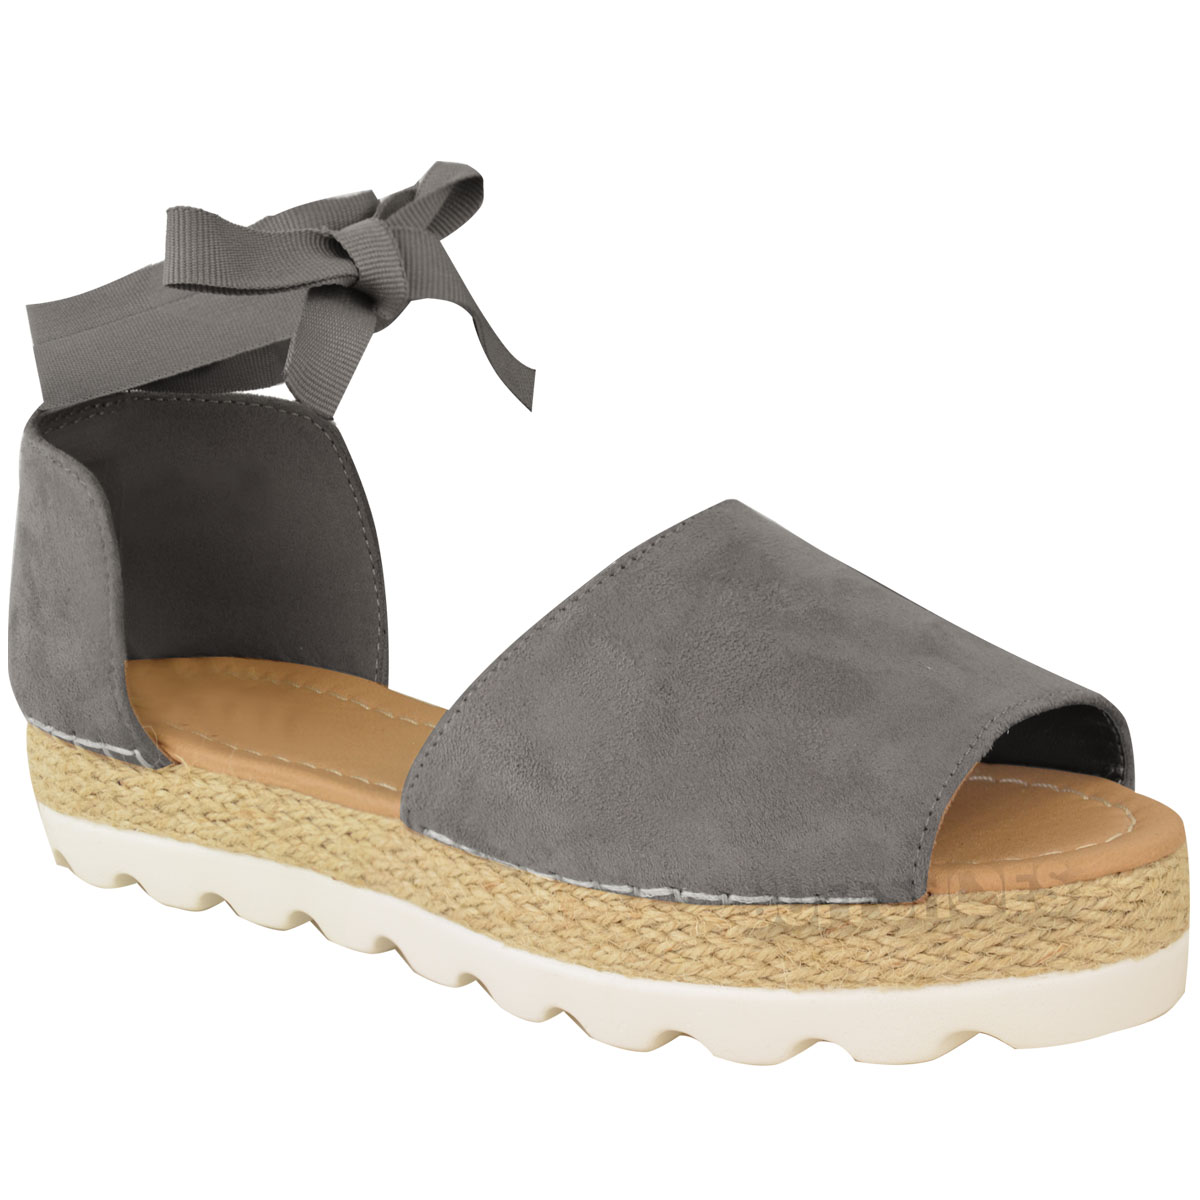 Womens Ladies Flat Lace Up Sandals Espadrilles Summer ...